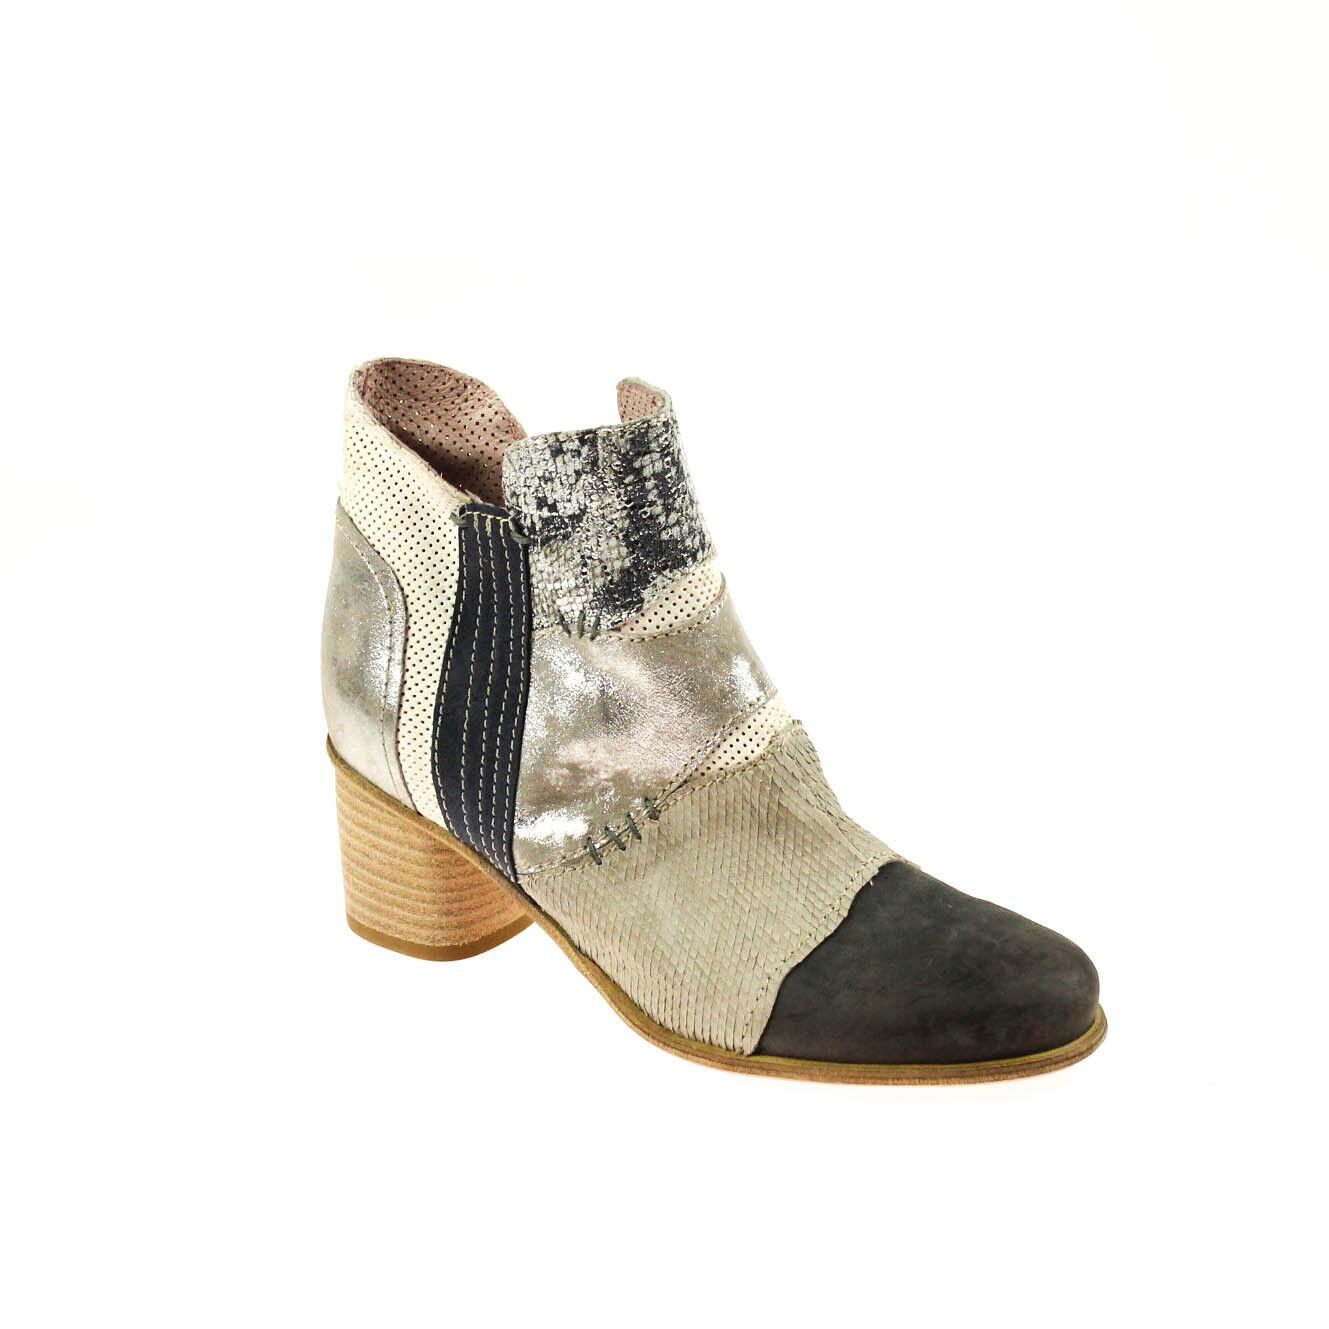 Charme Damen Stiefelette Halbschuh Leder Grau Dunkelgrau Silber Weiß Größe 37